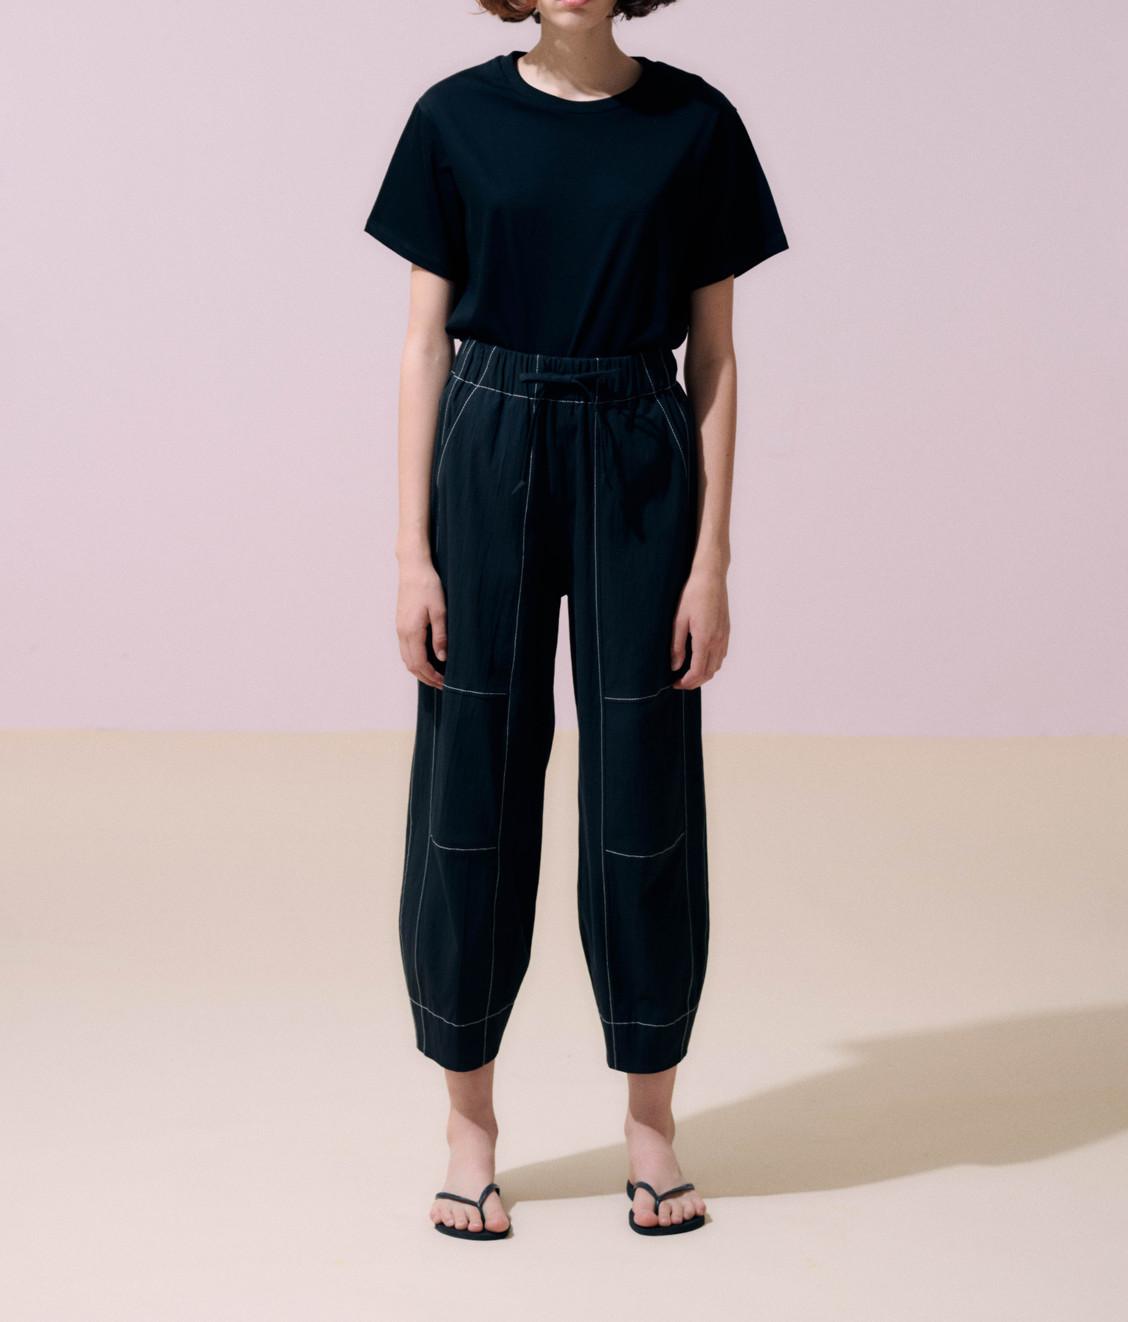 NEUL Neul Contrast Stitch Comfy Pants Black